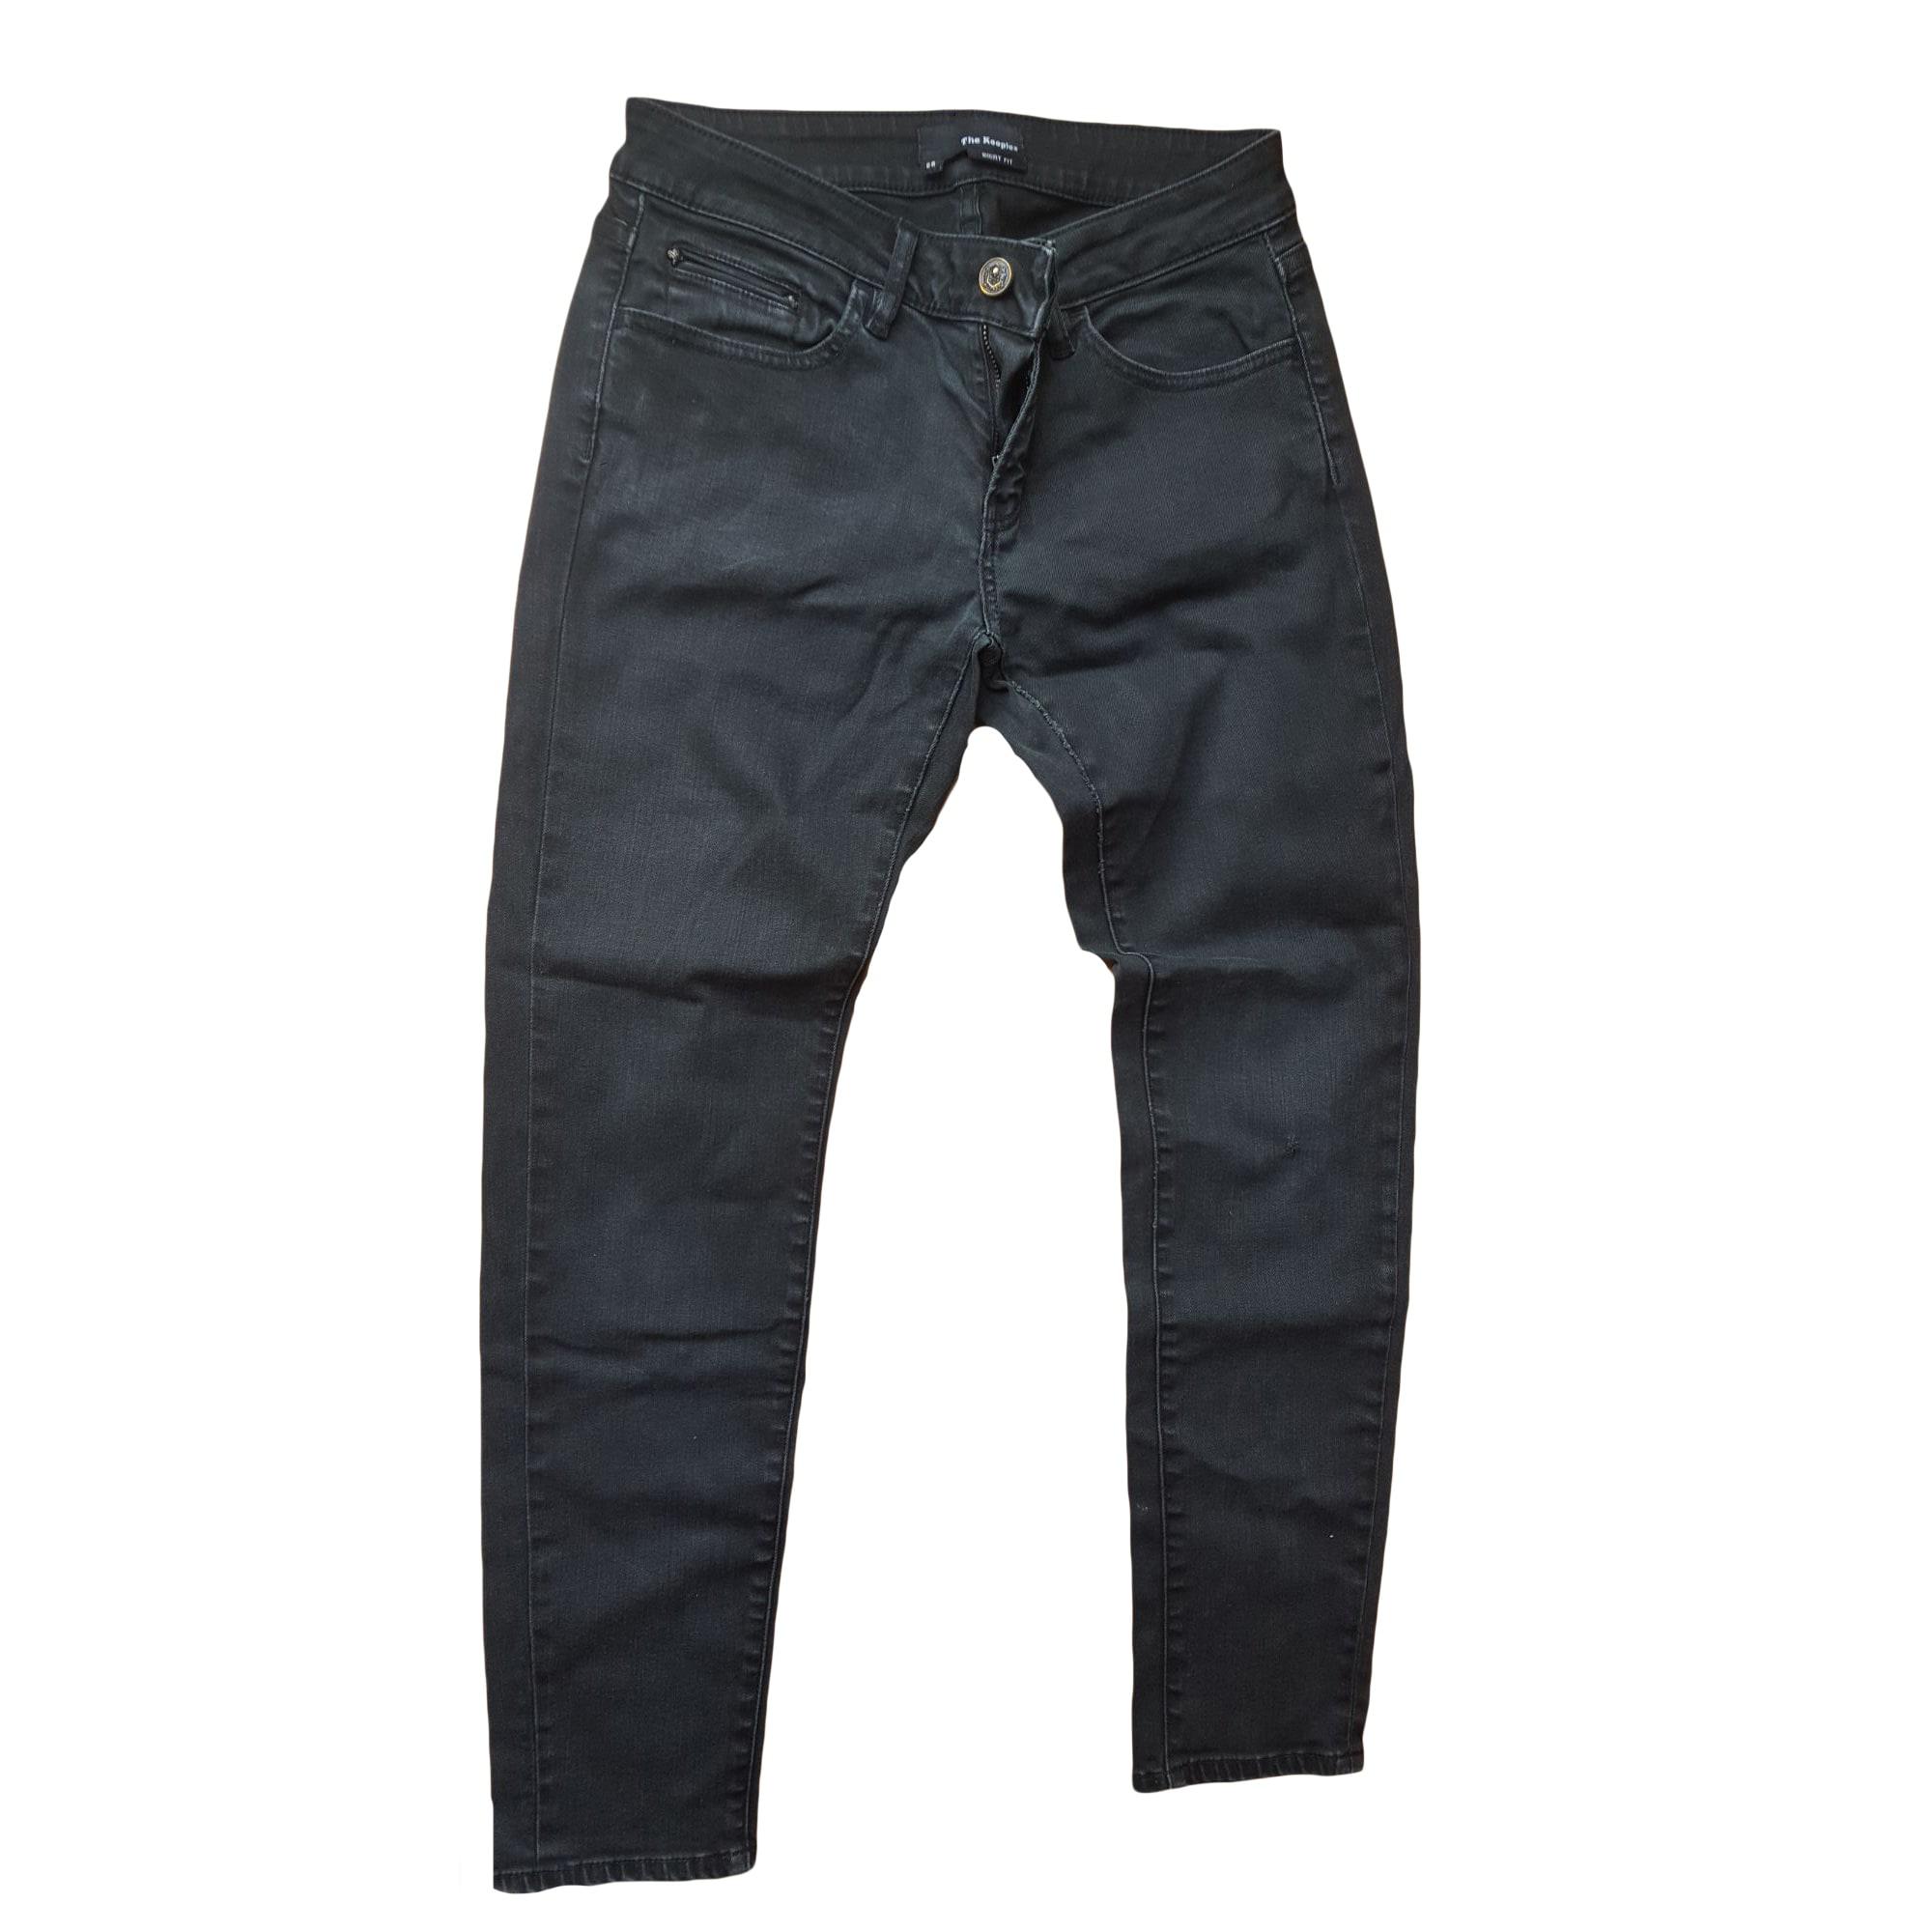 Pantalon slim, cigarette THE KOOPLES Marron